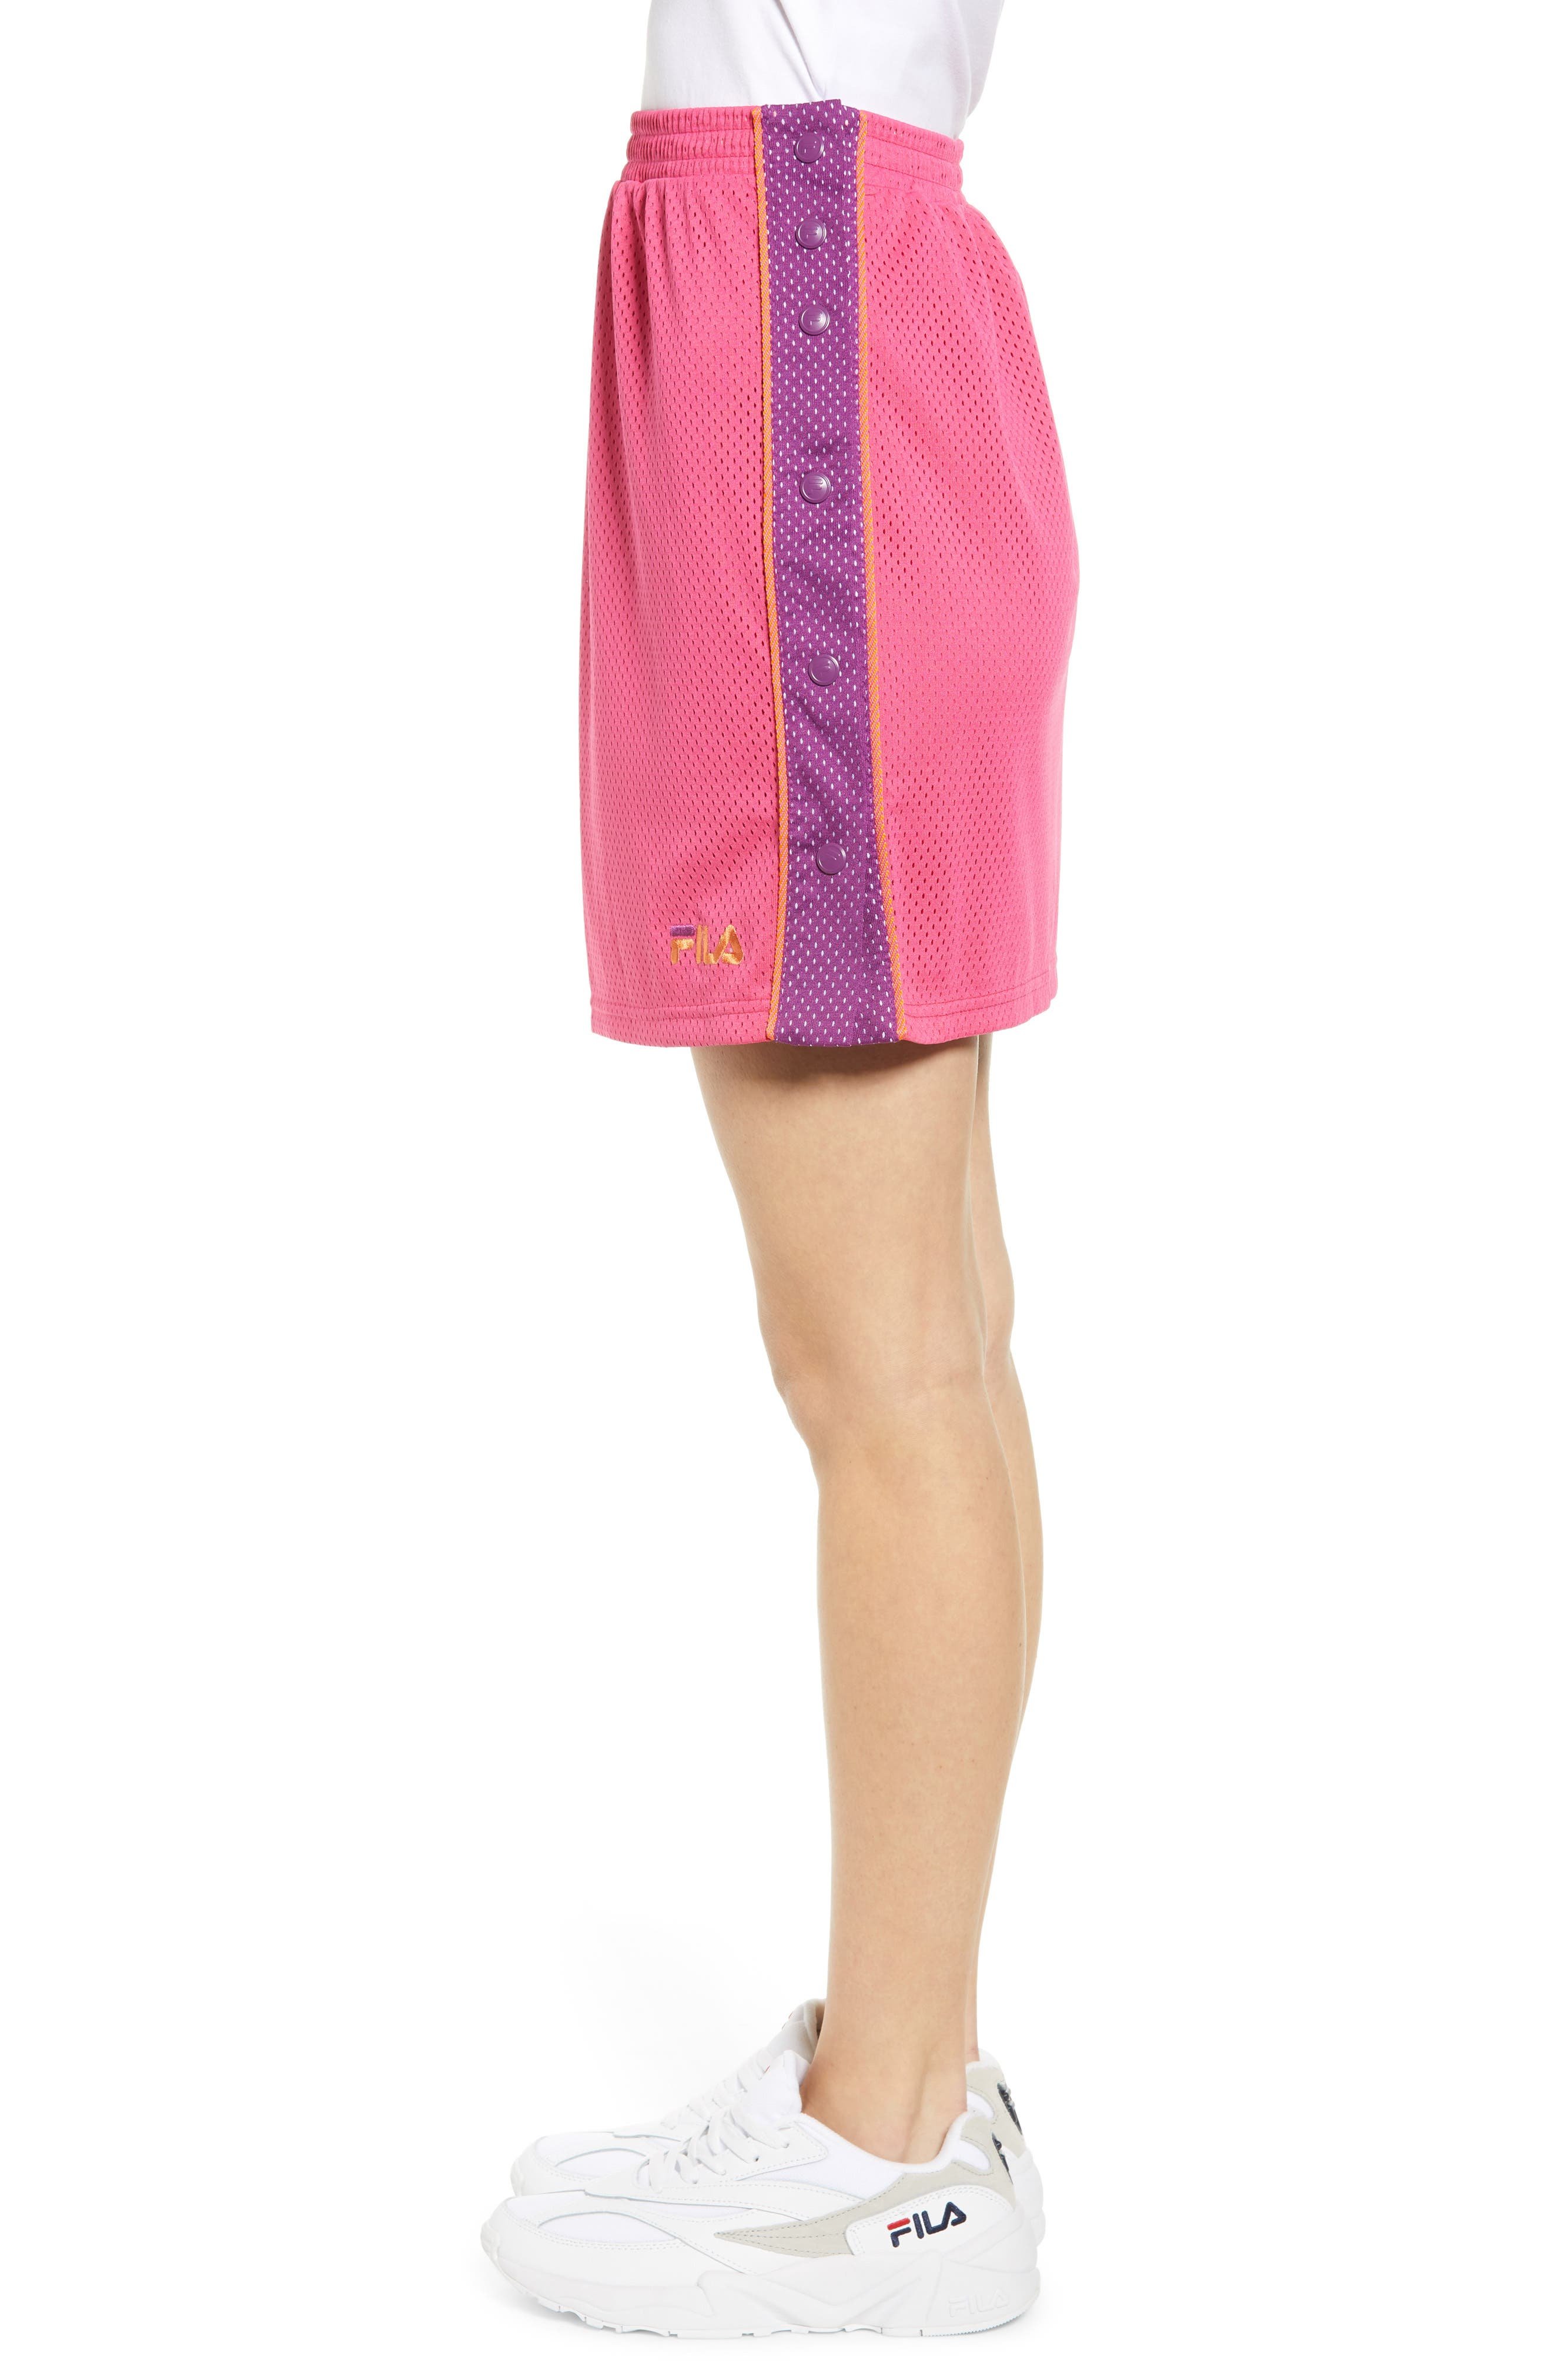 FILA, Miriam Tearaway Miniskirt, Alternate thumbnail 5, color, FUCHSIA PURPLE/ GRAPE/ GREEN